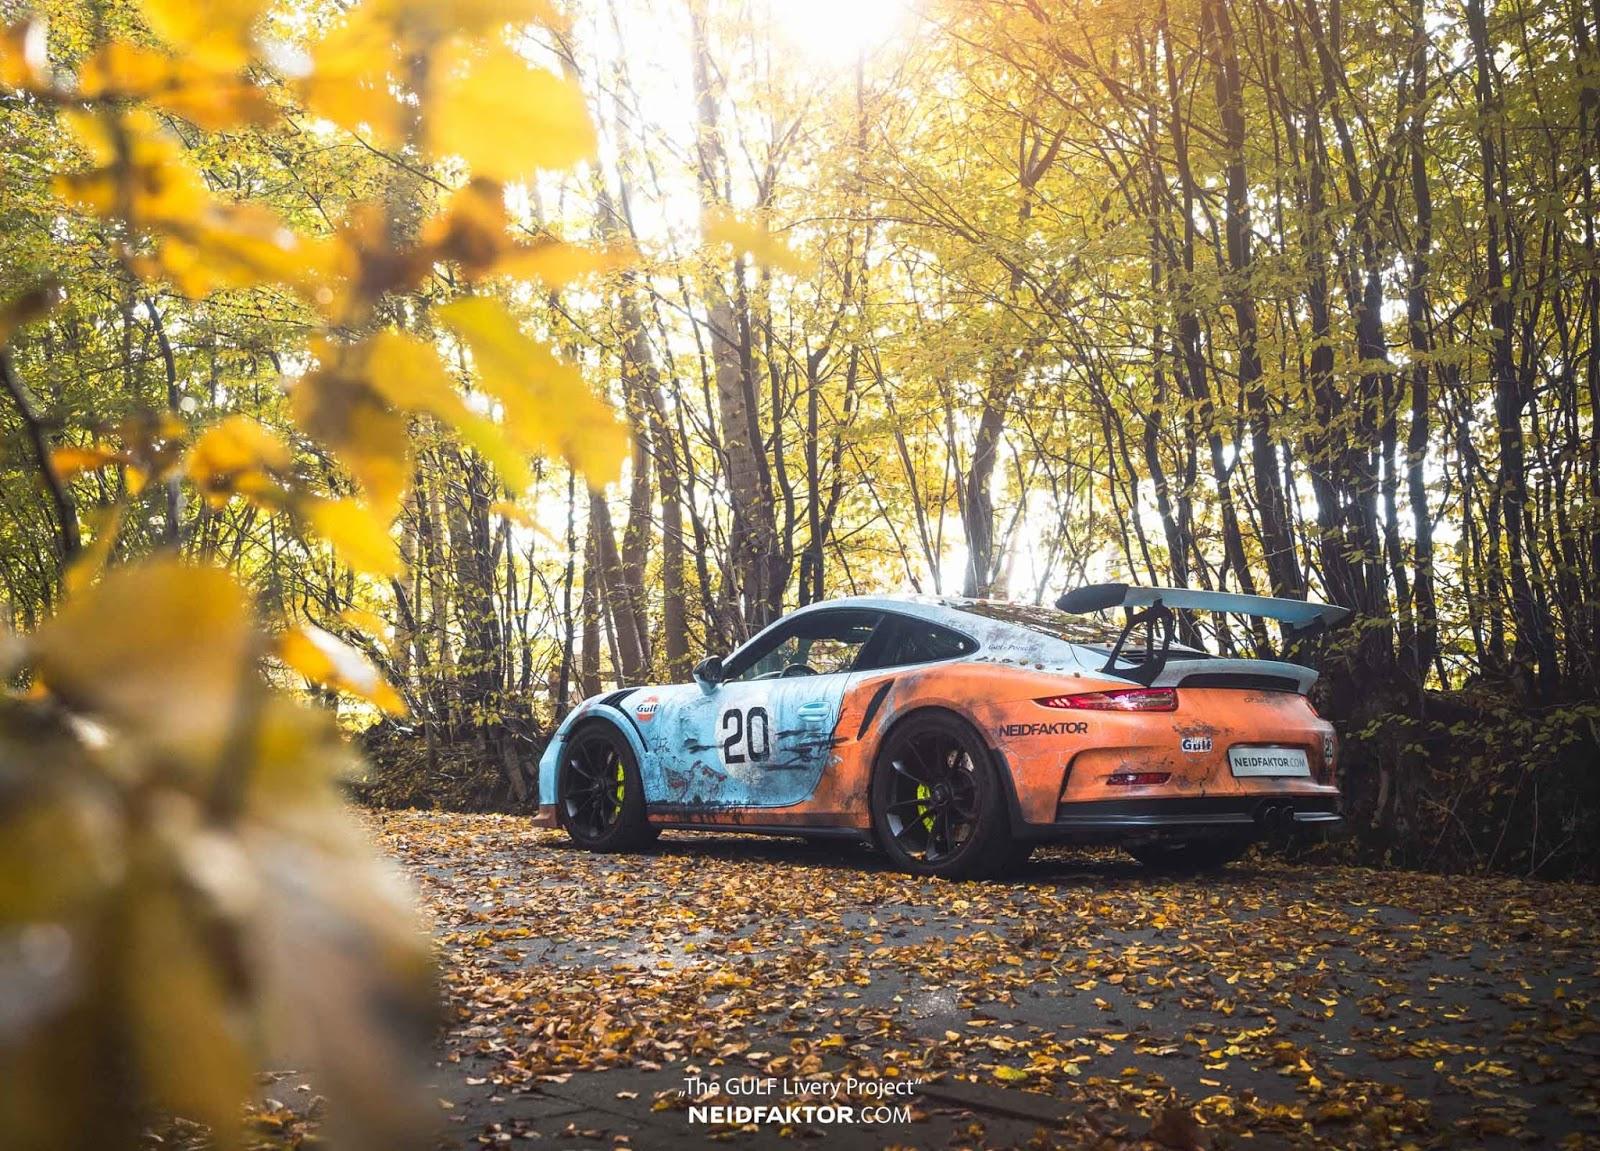 Porsche 911 GT3 RS by Neidfaktor